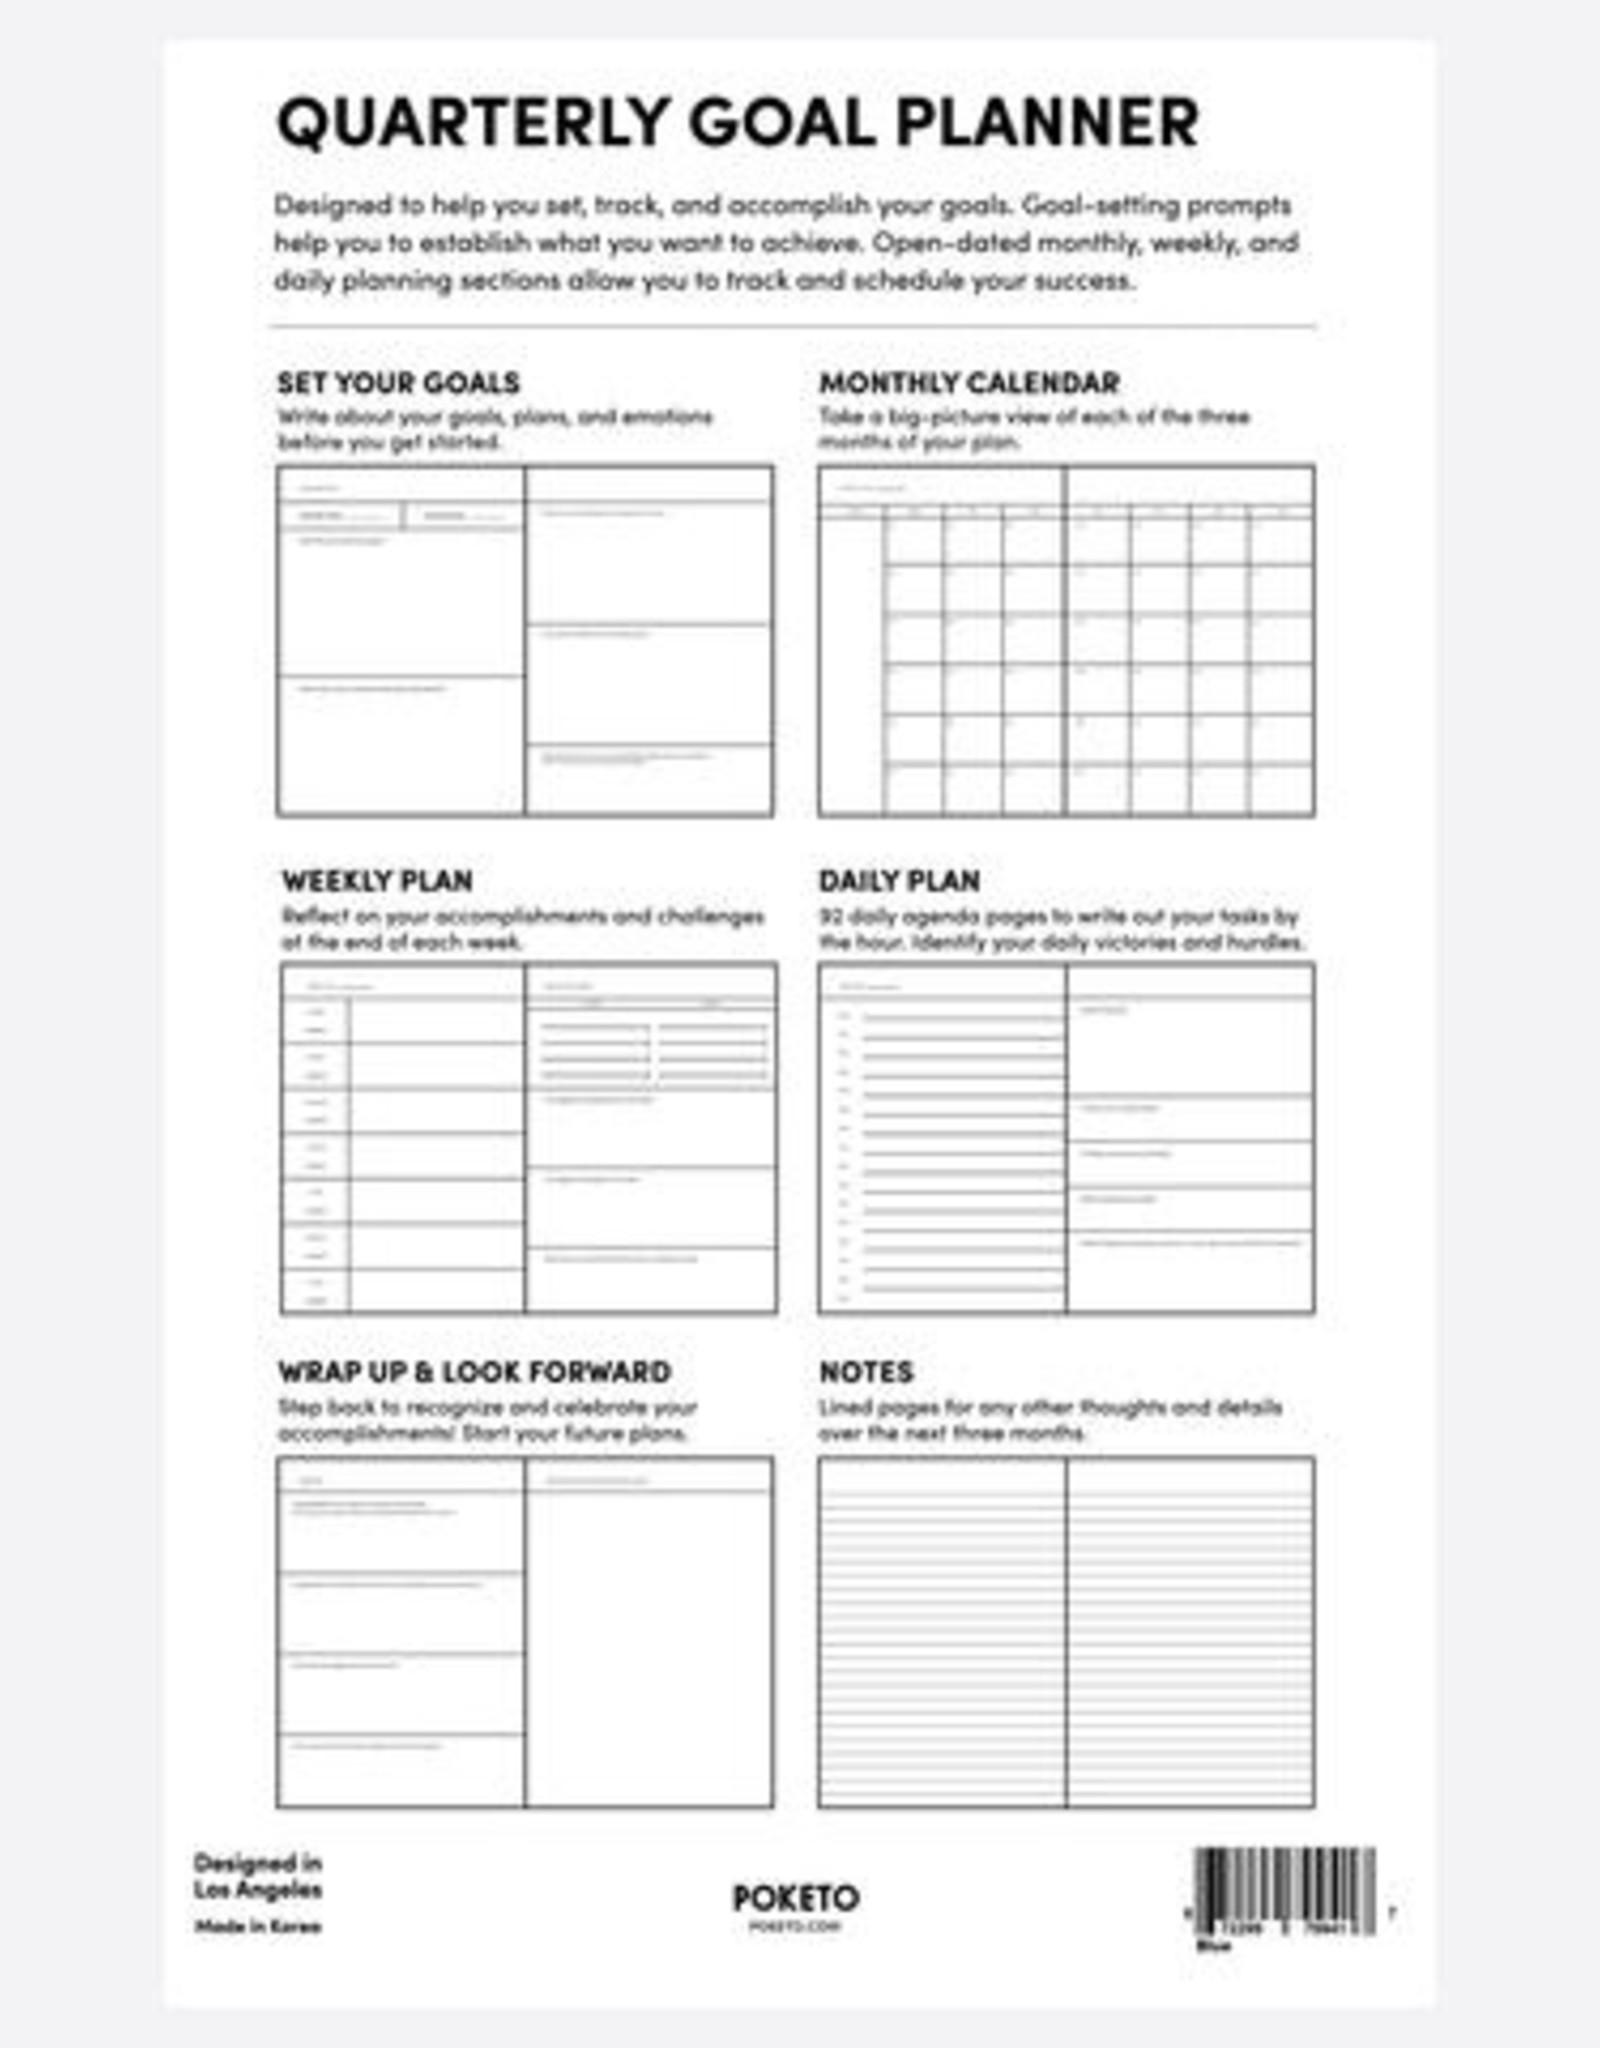 Poketo Quarterly Goal Planner - Yellow